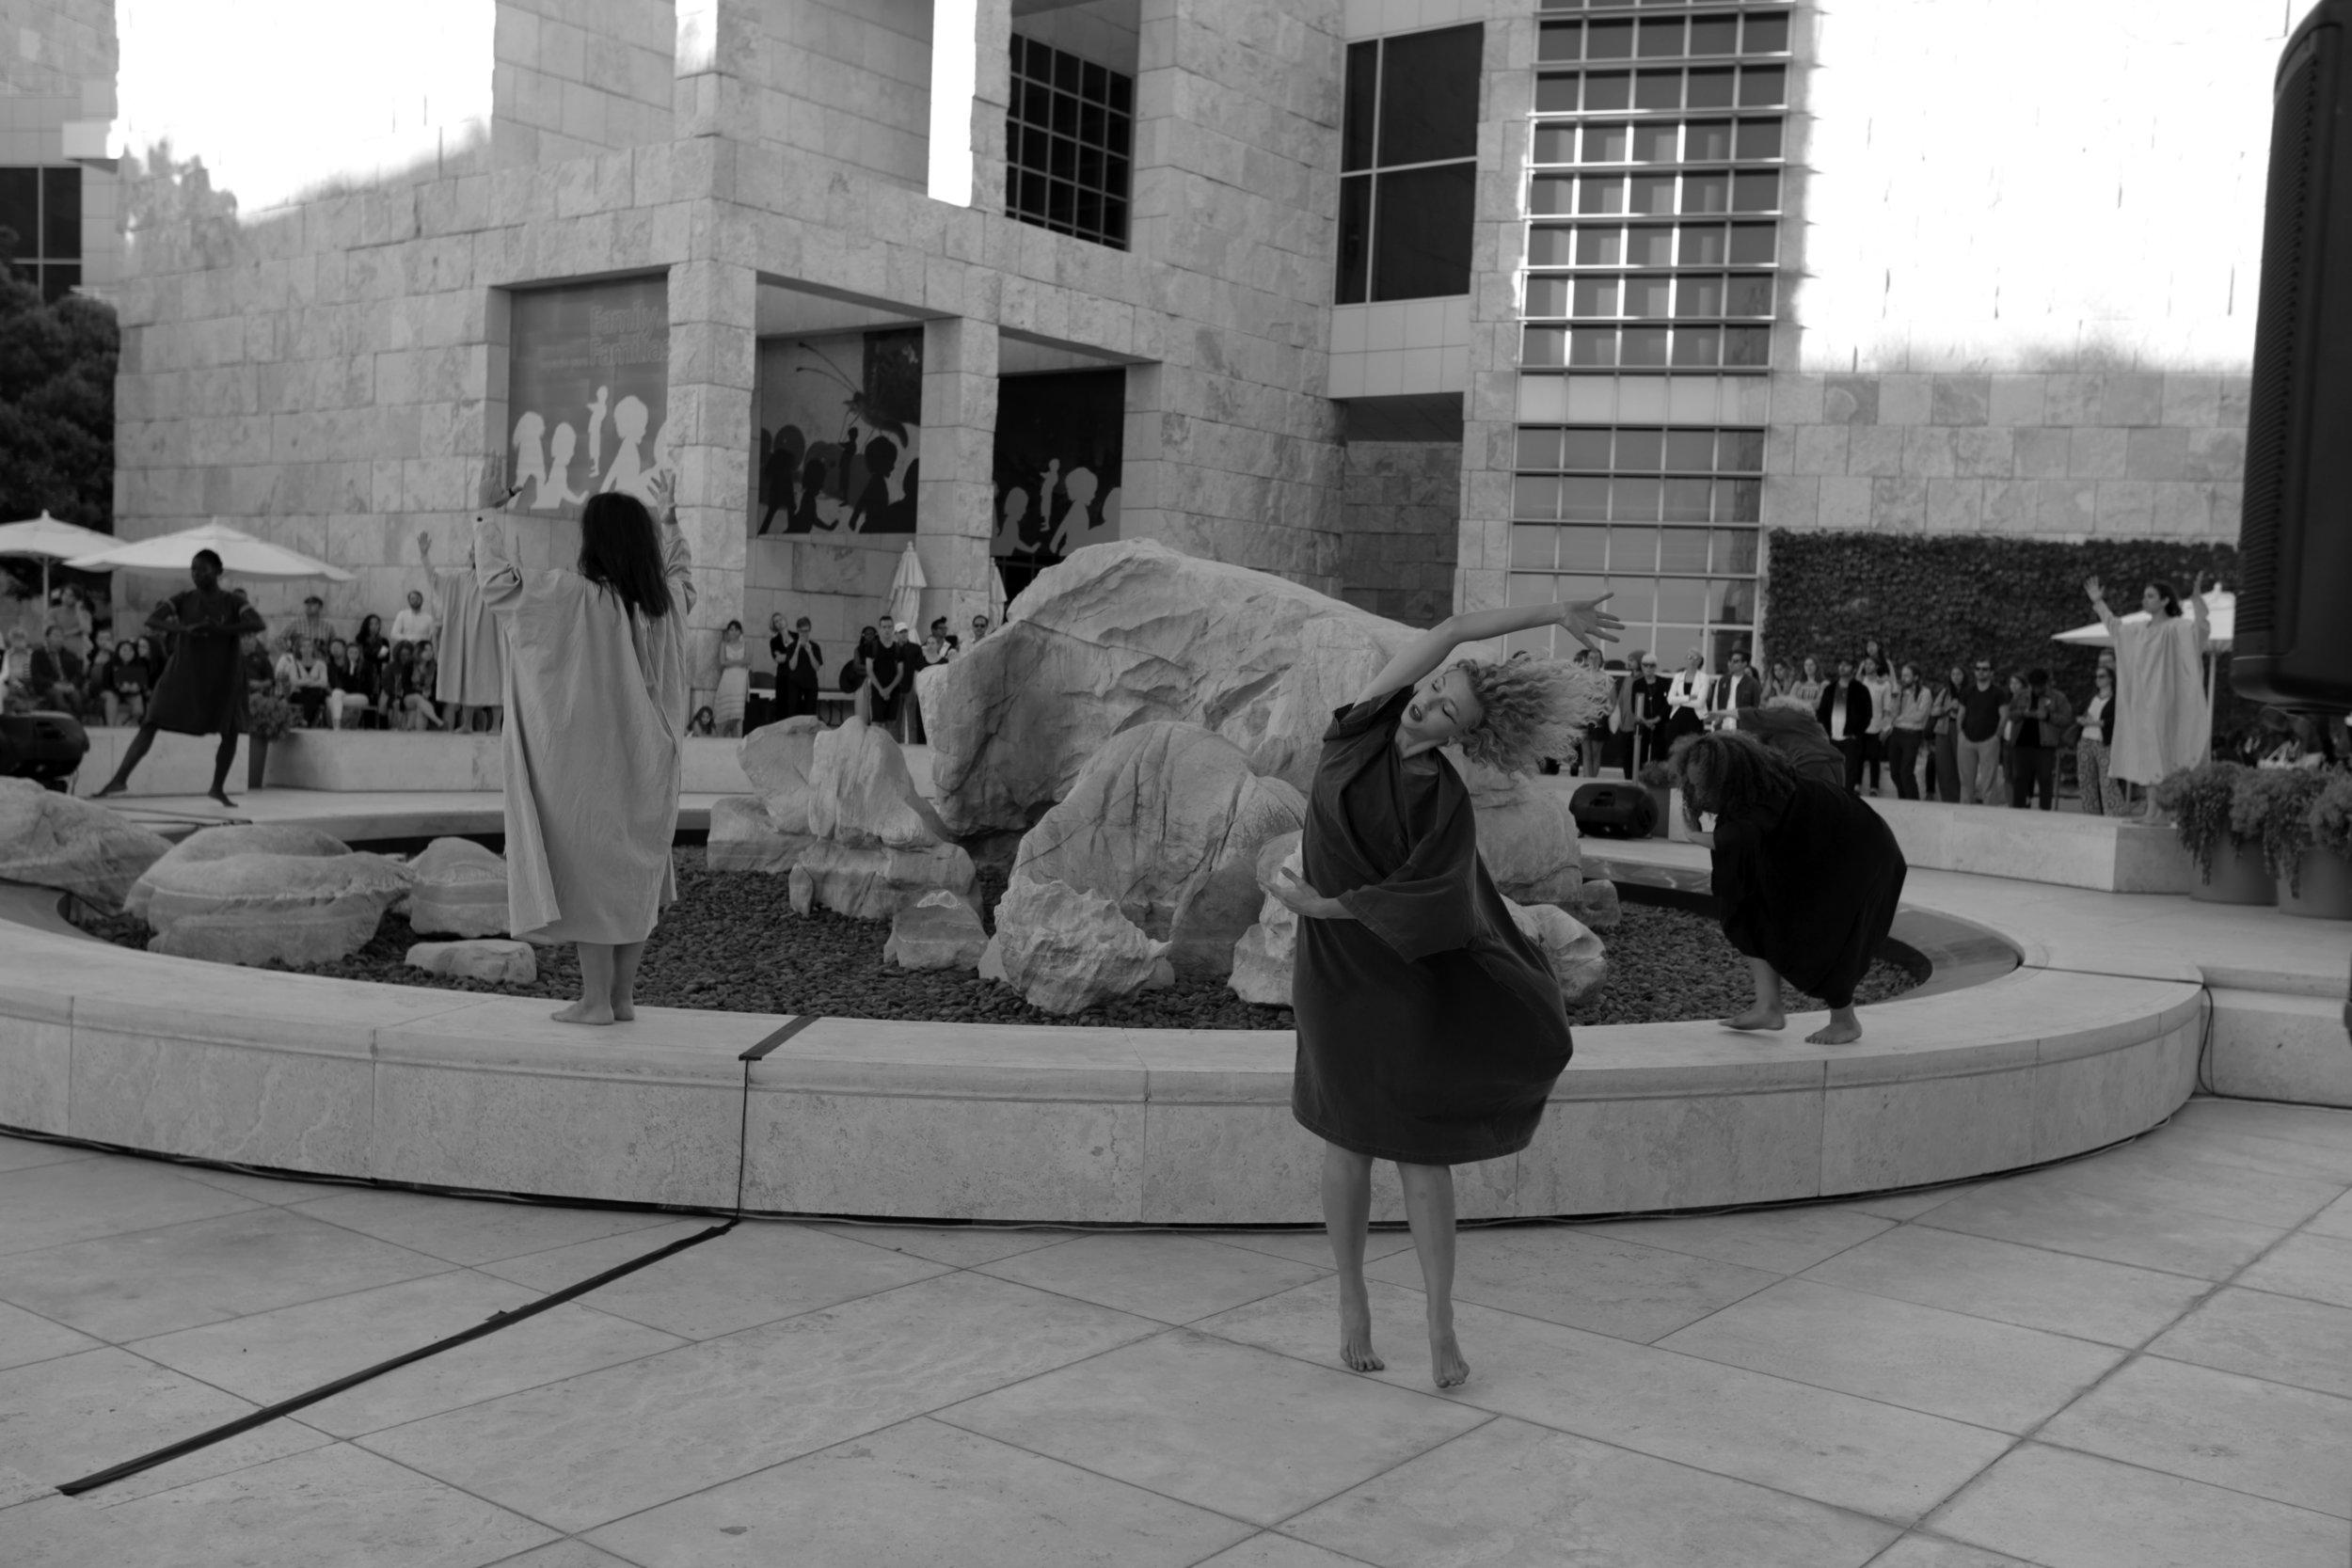 Song of Eurydice at Getty Center July 2016. L-R: (choreographer/Eurydice) mecca vazie andrews, Jiha Lee, Jess Basta, Cortney Alexander, Dai Janai Lopez, Rachel Mason. Costume by 69